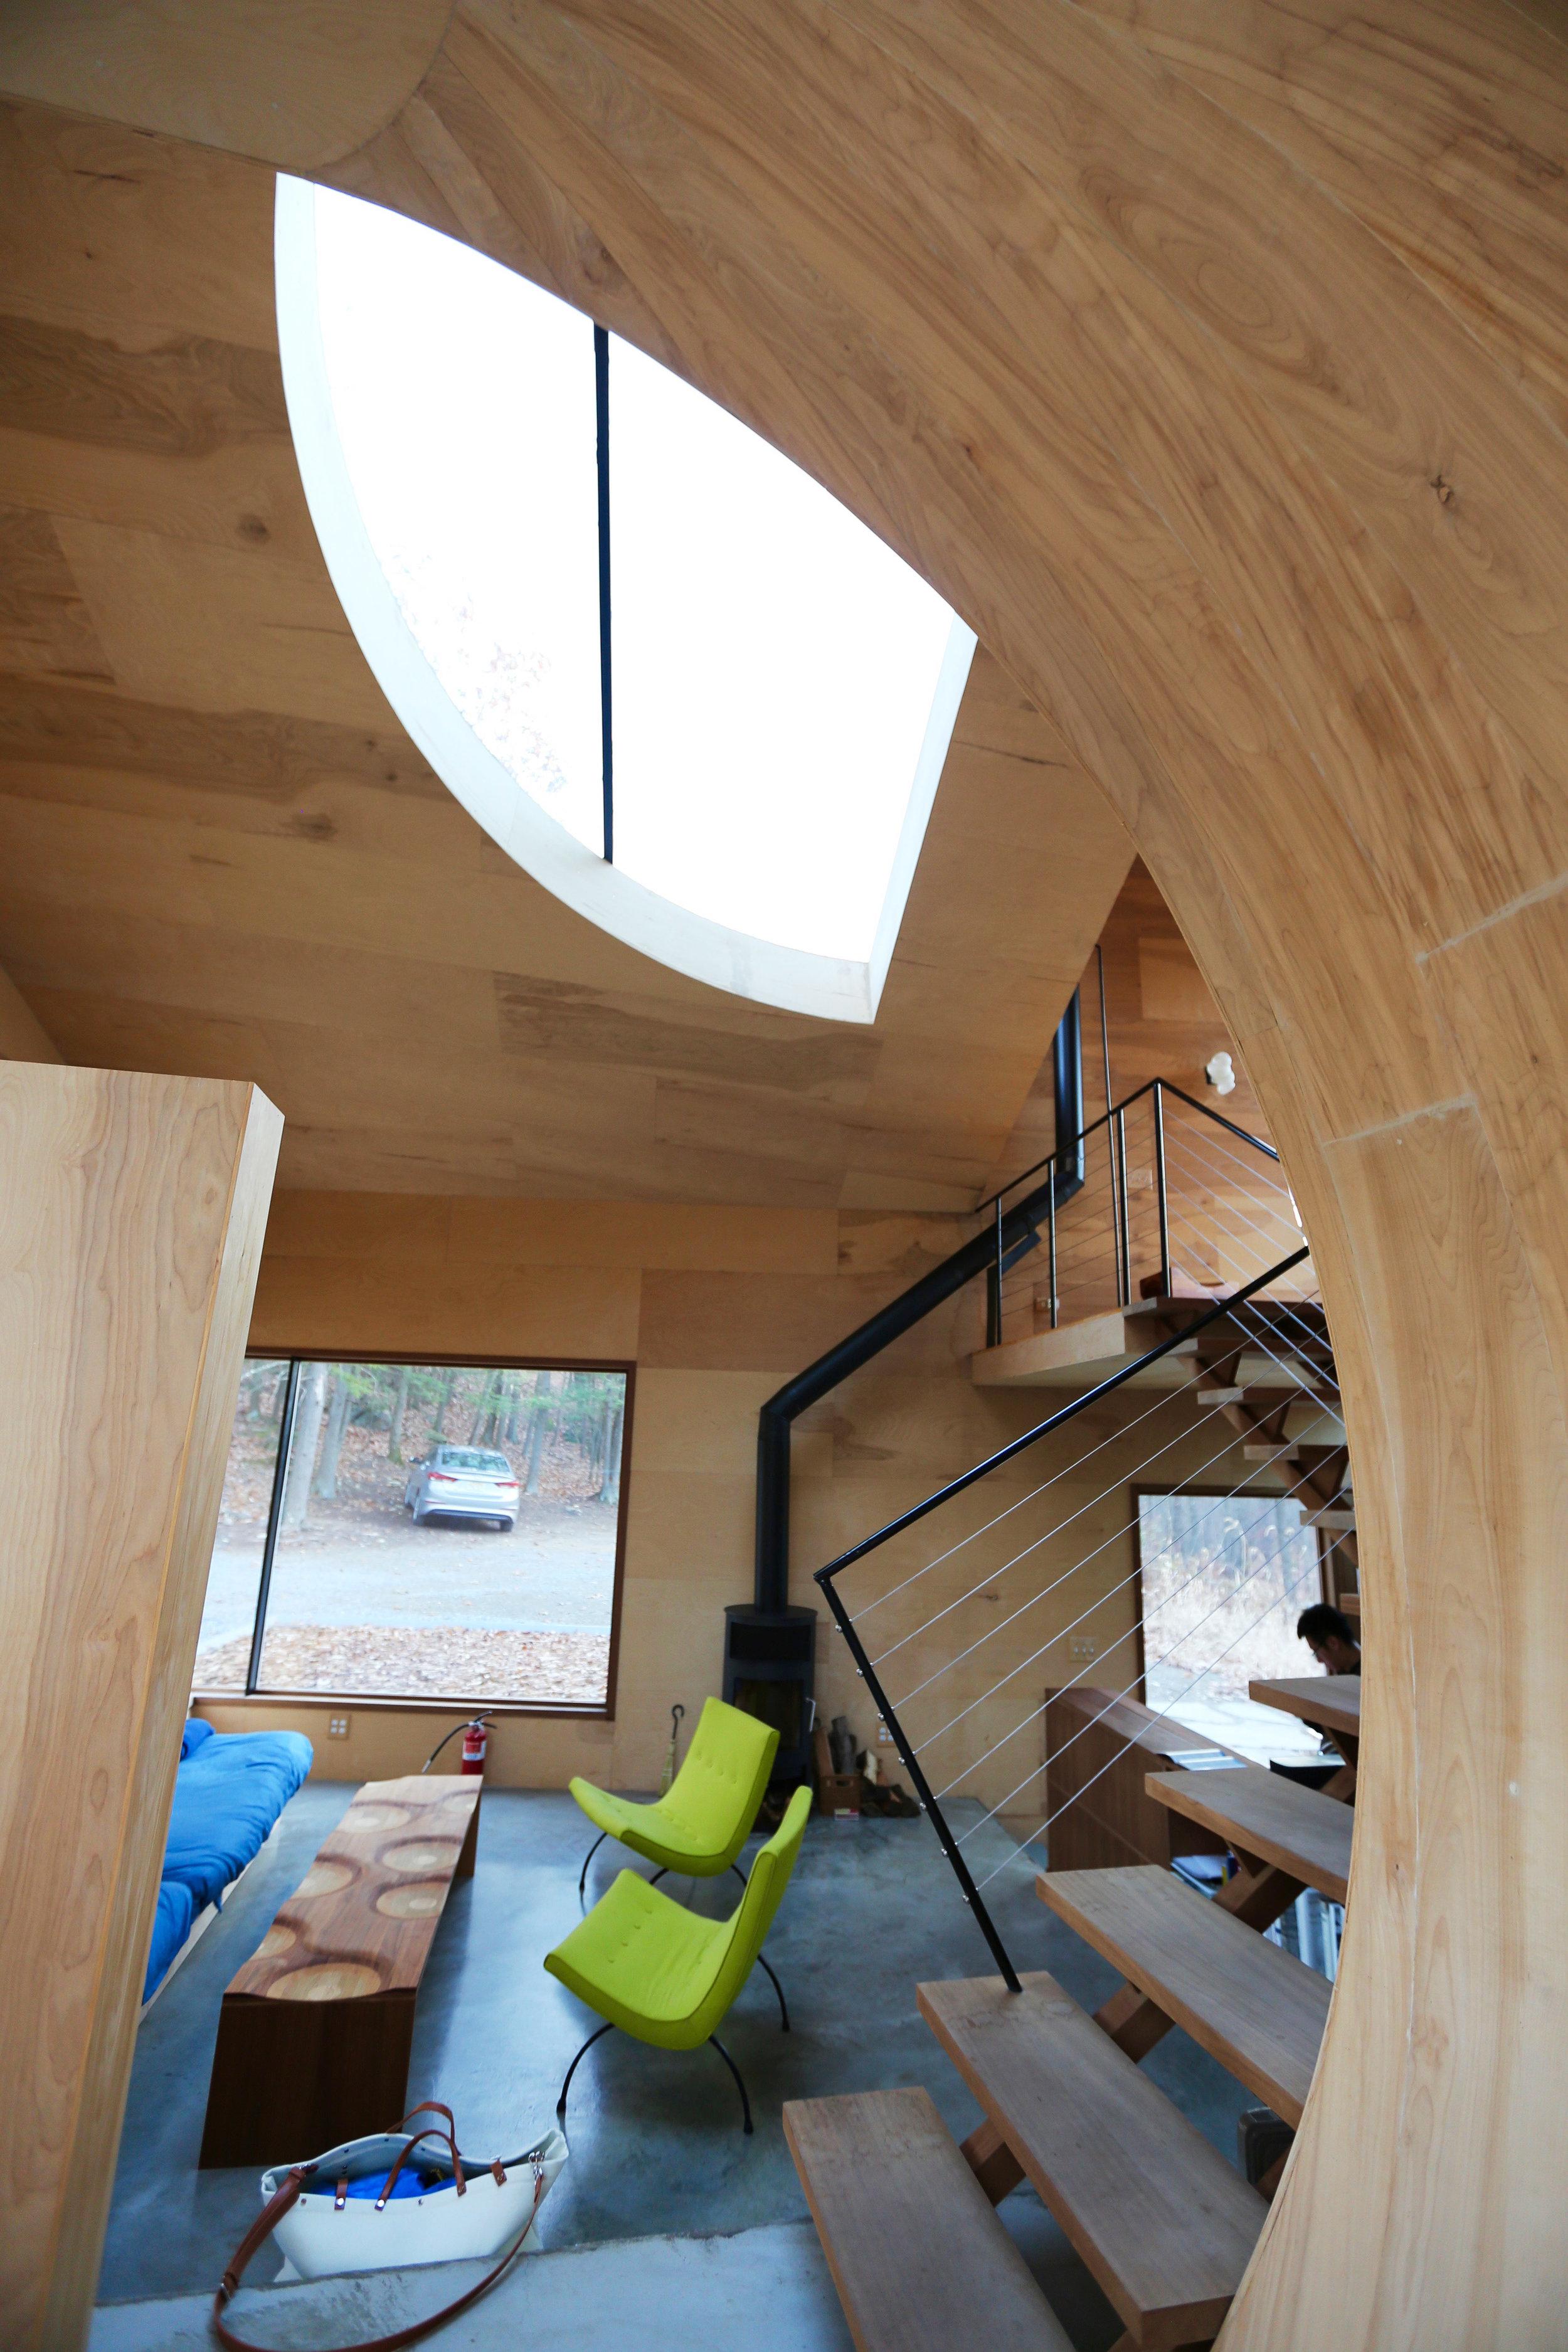 ex of in steven holl house architectual design.jpg